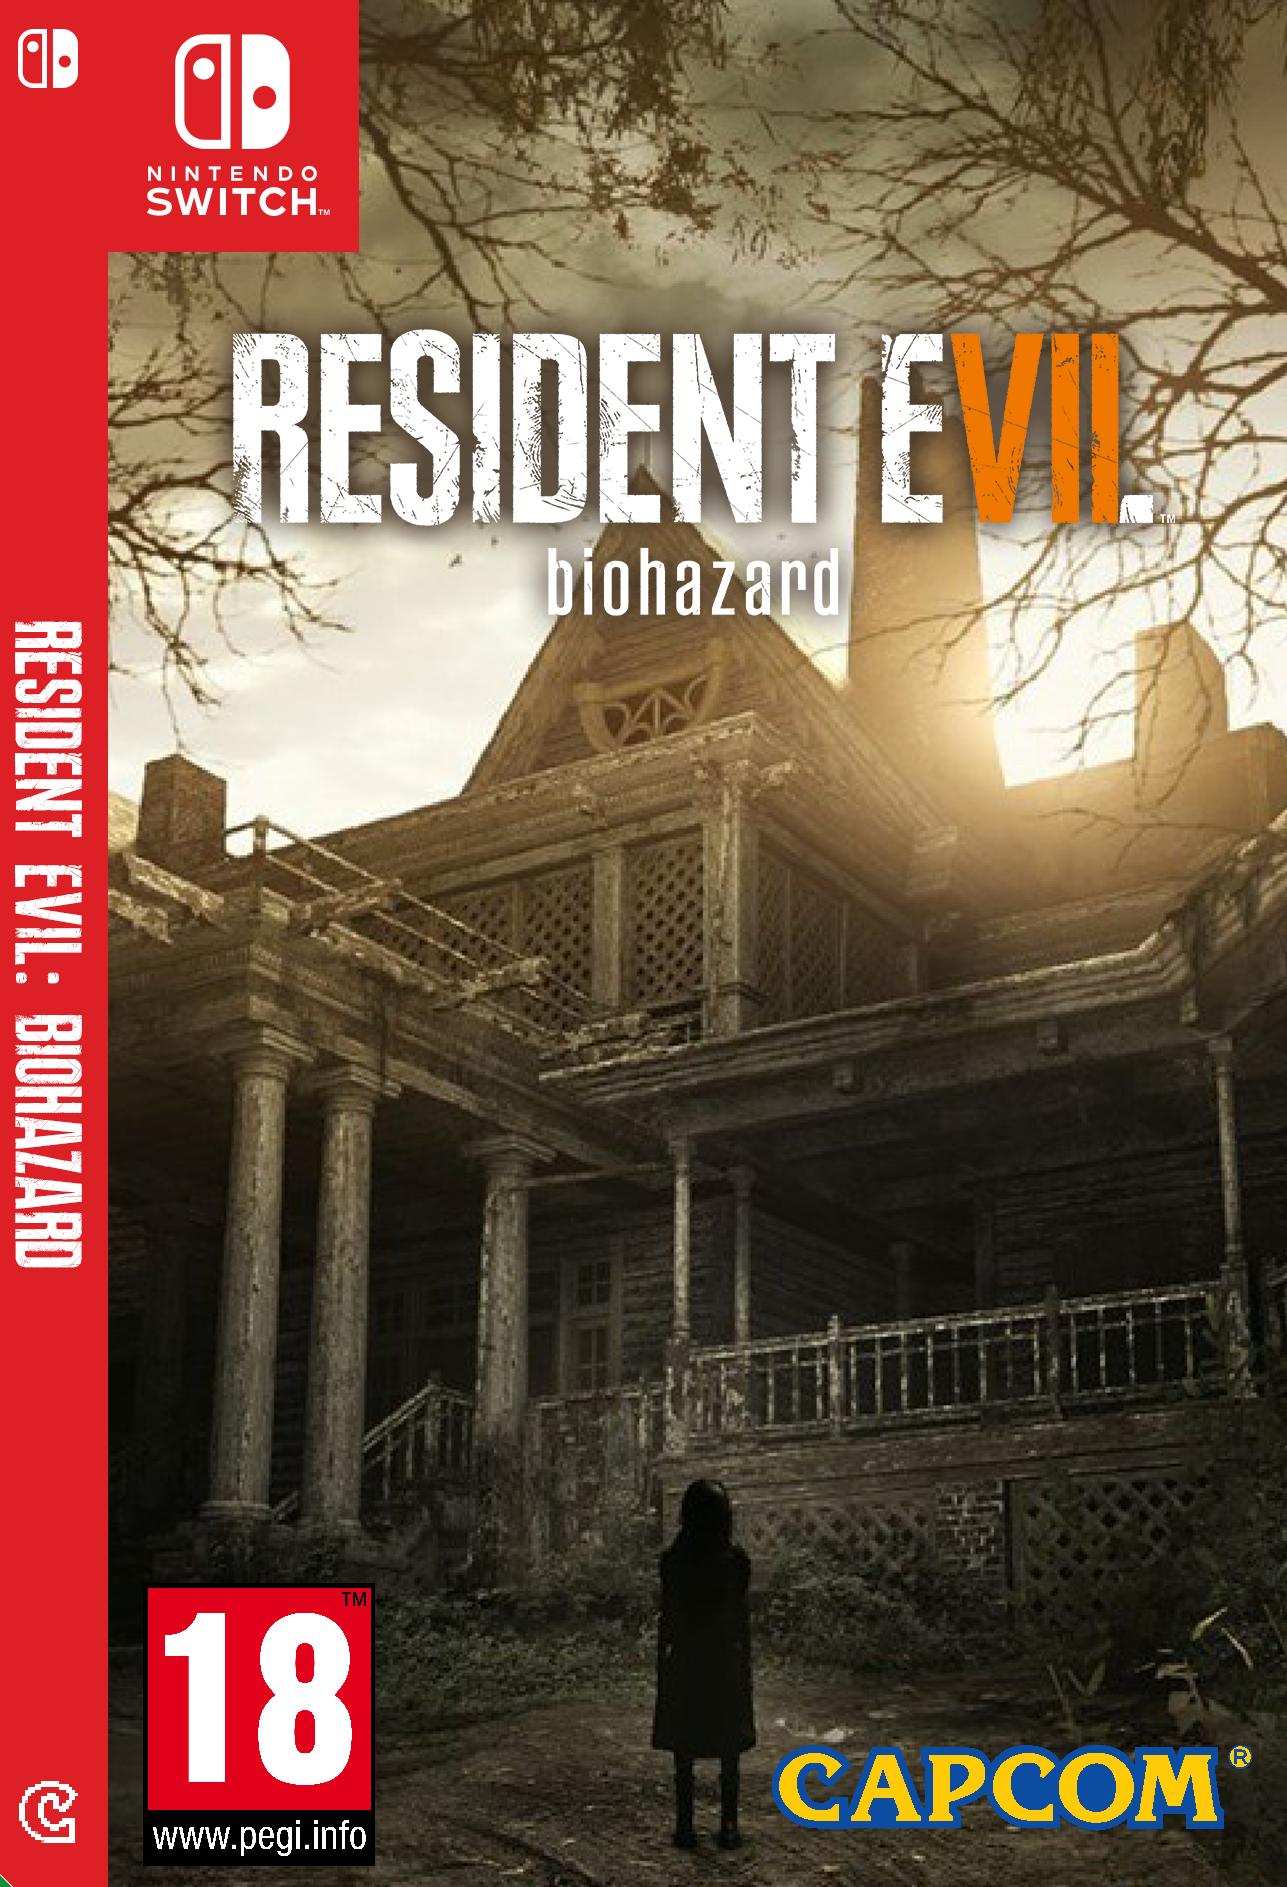 Resident Evil 7 biohazard : Cloud Version